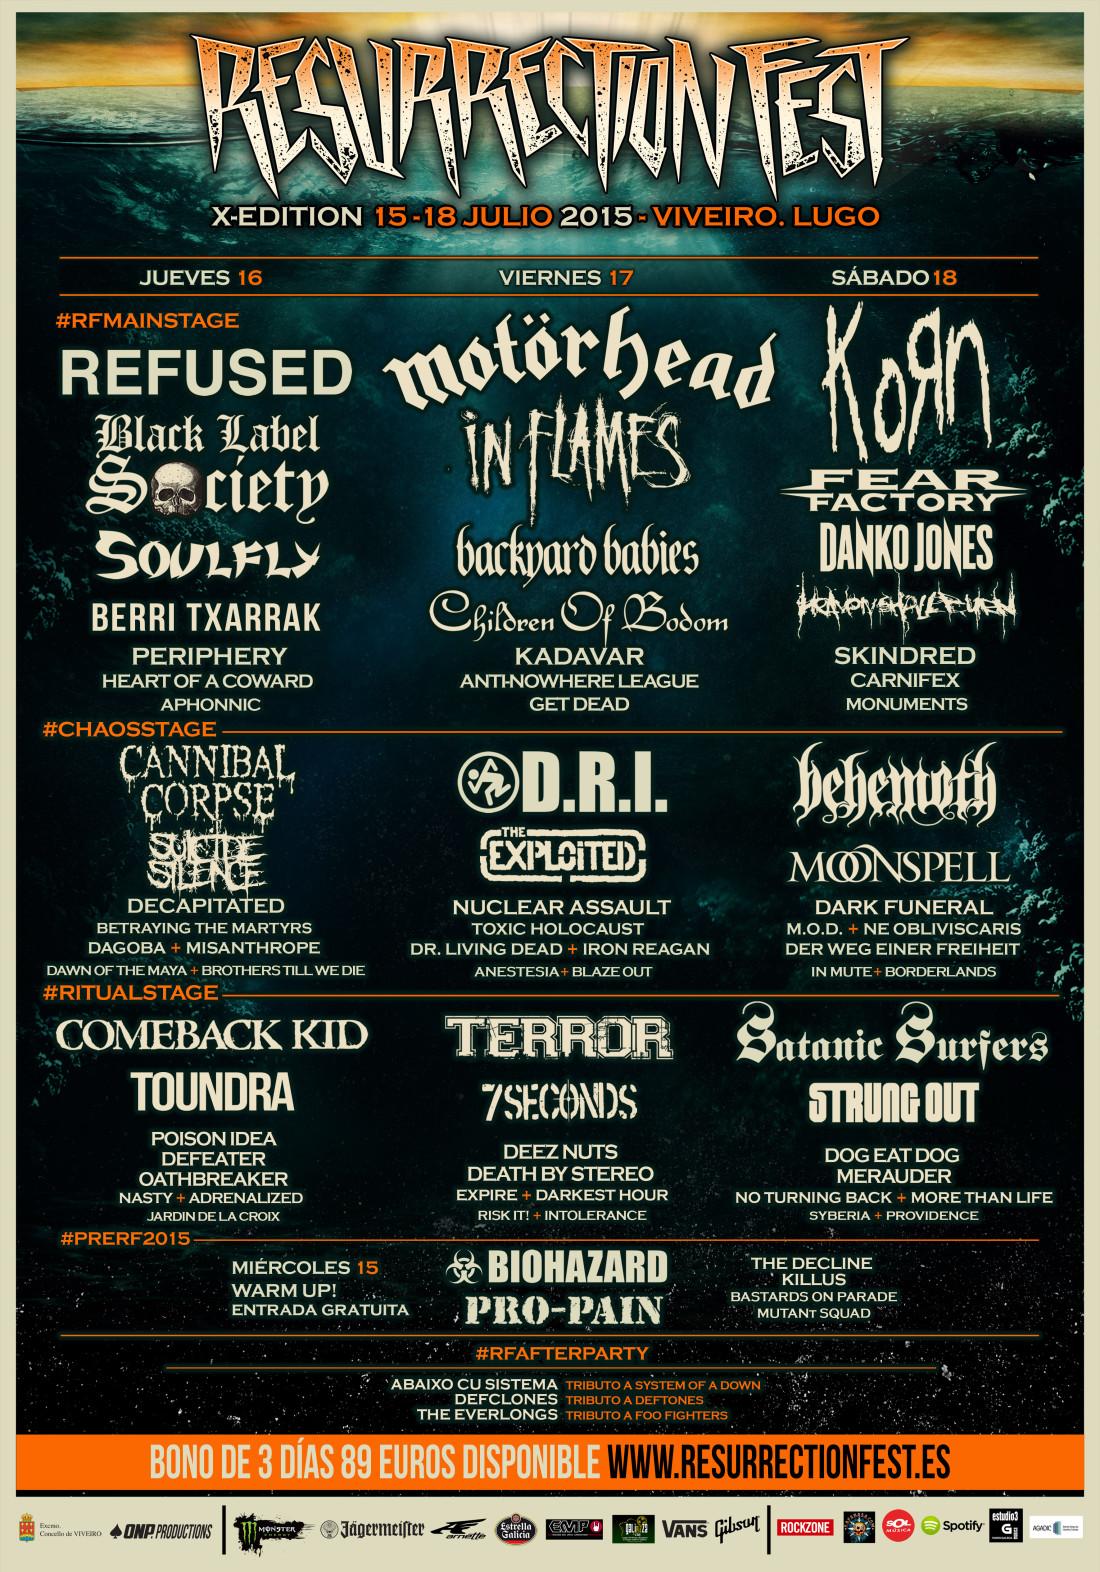 Cartel completo por días Resurrection Fest 2015